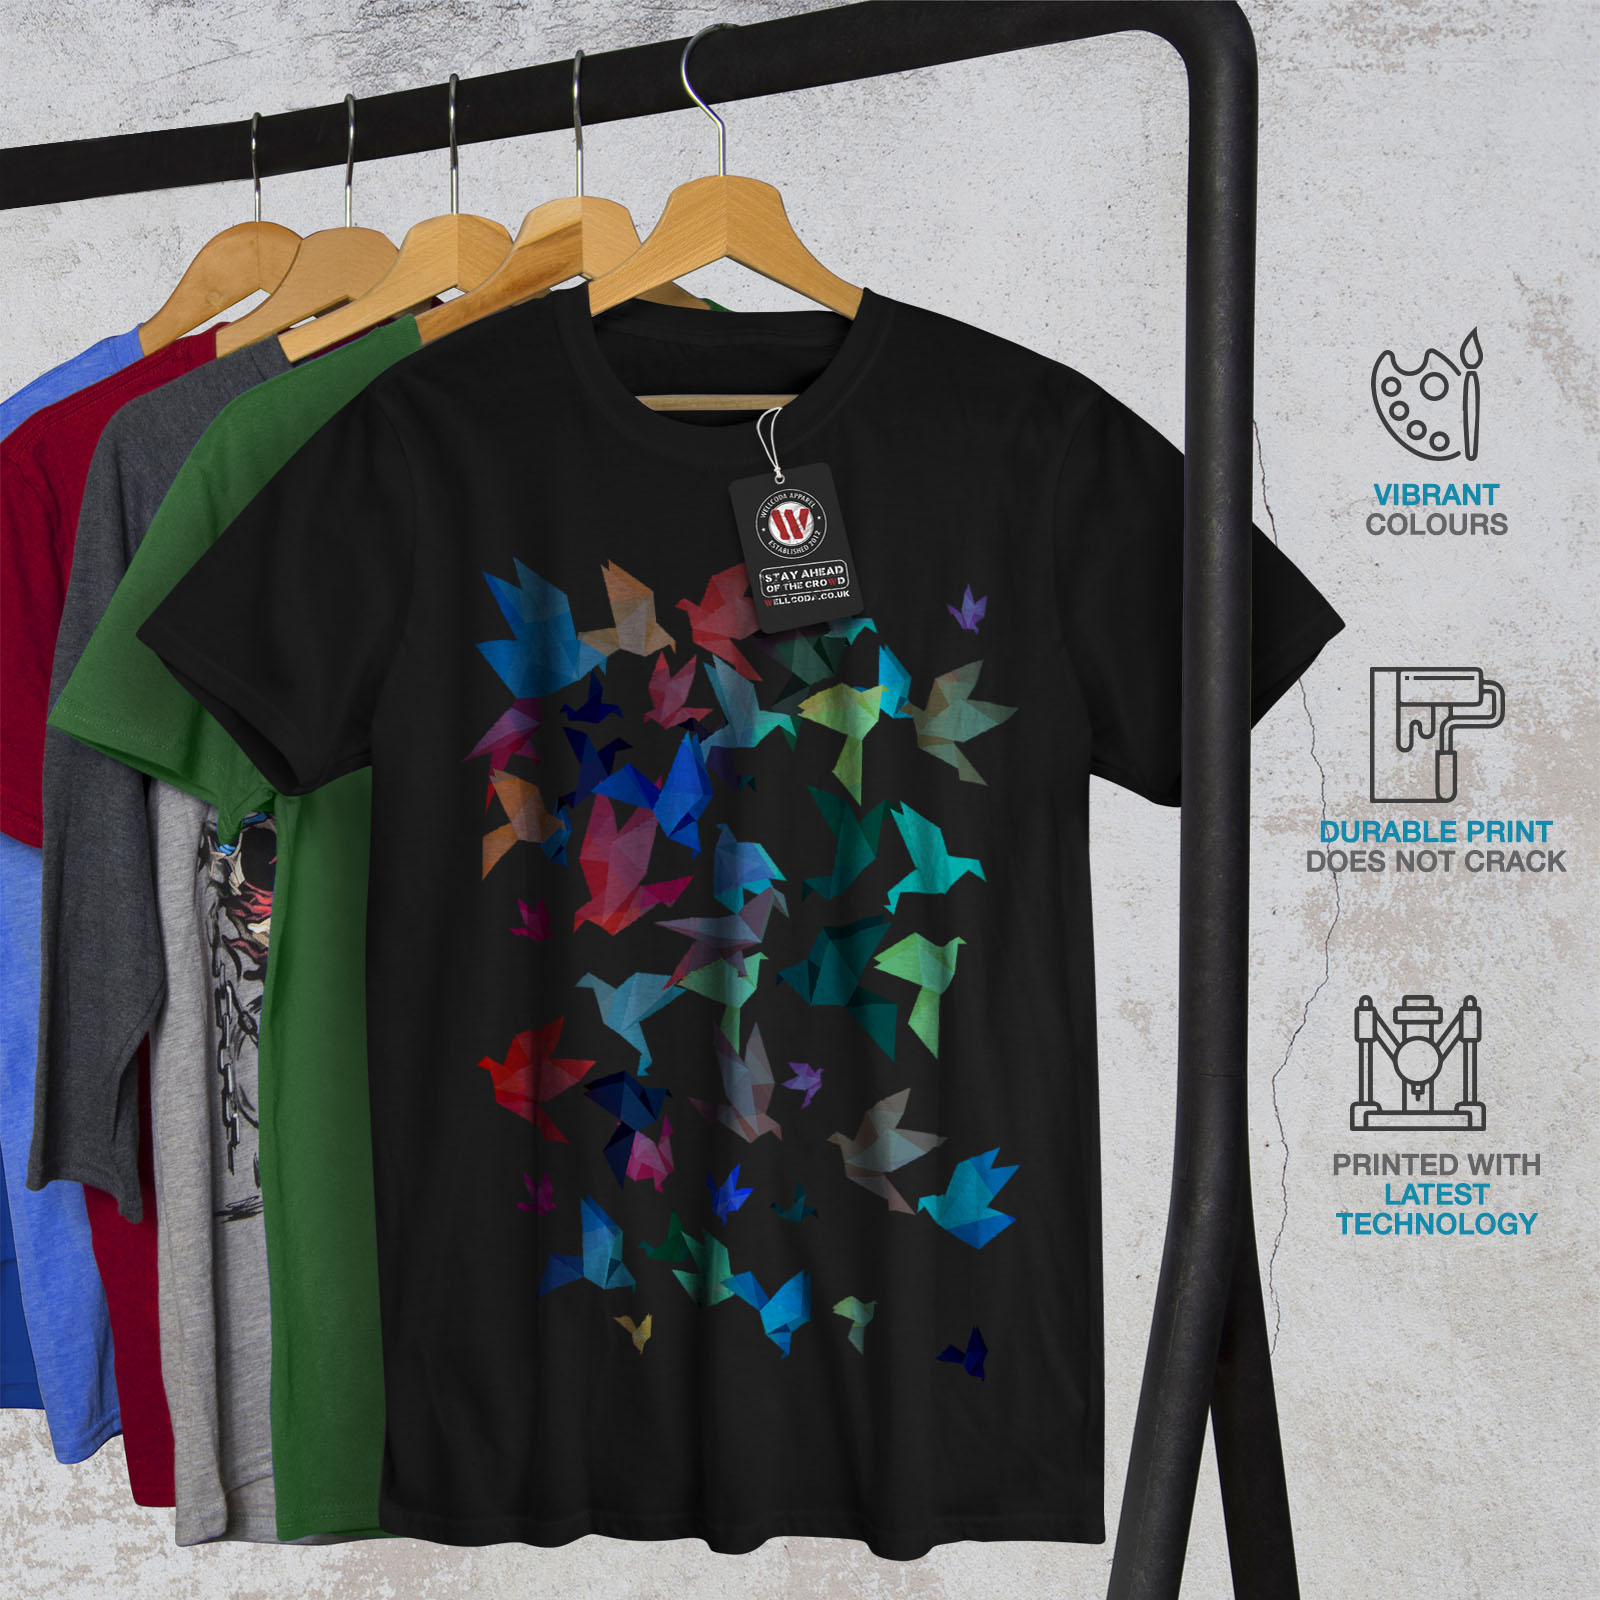 Wellcoda-Origami-Bird-Colors-Mens-T-shirt-Craft-Graphic-Design-Printed-Tee thumbnail 6